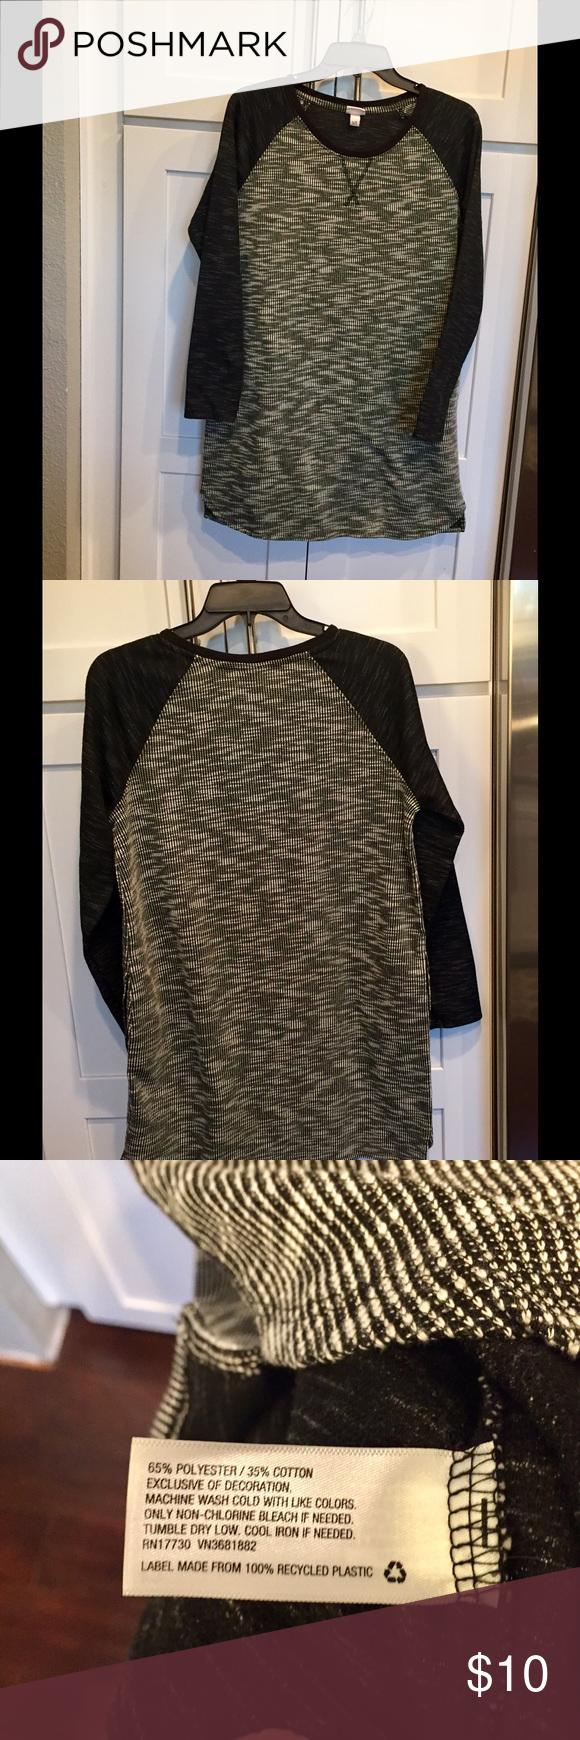 Merona knit dress Black and white Merona knit dress. Looks cute with boots and leggings. Merona Dresses Long Sleeve